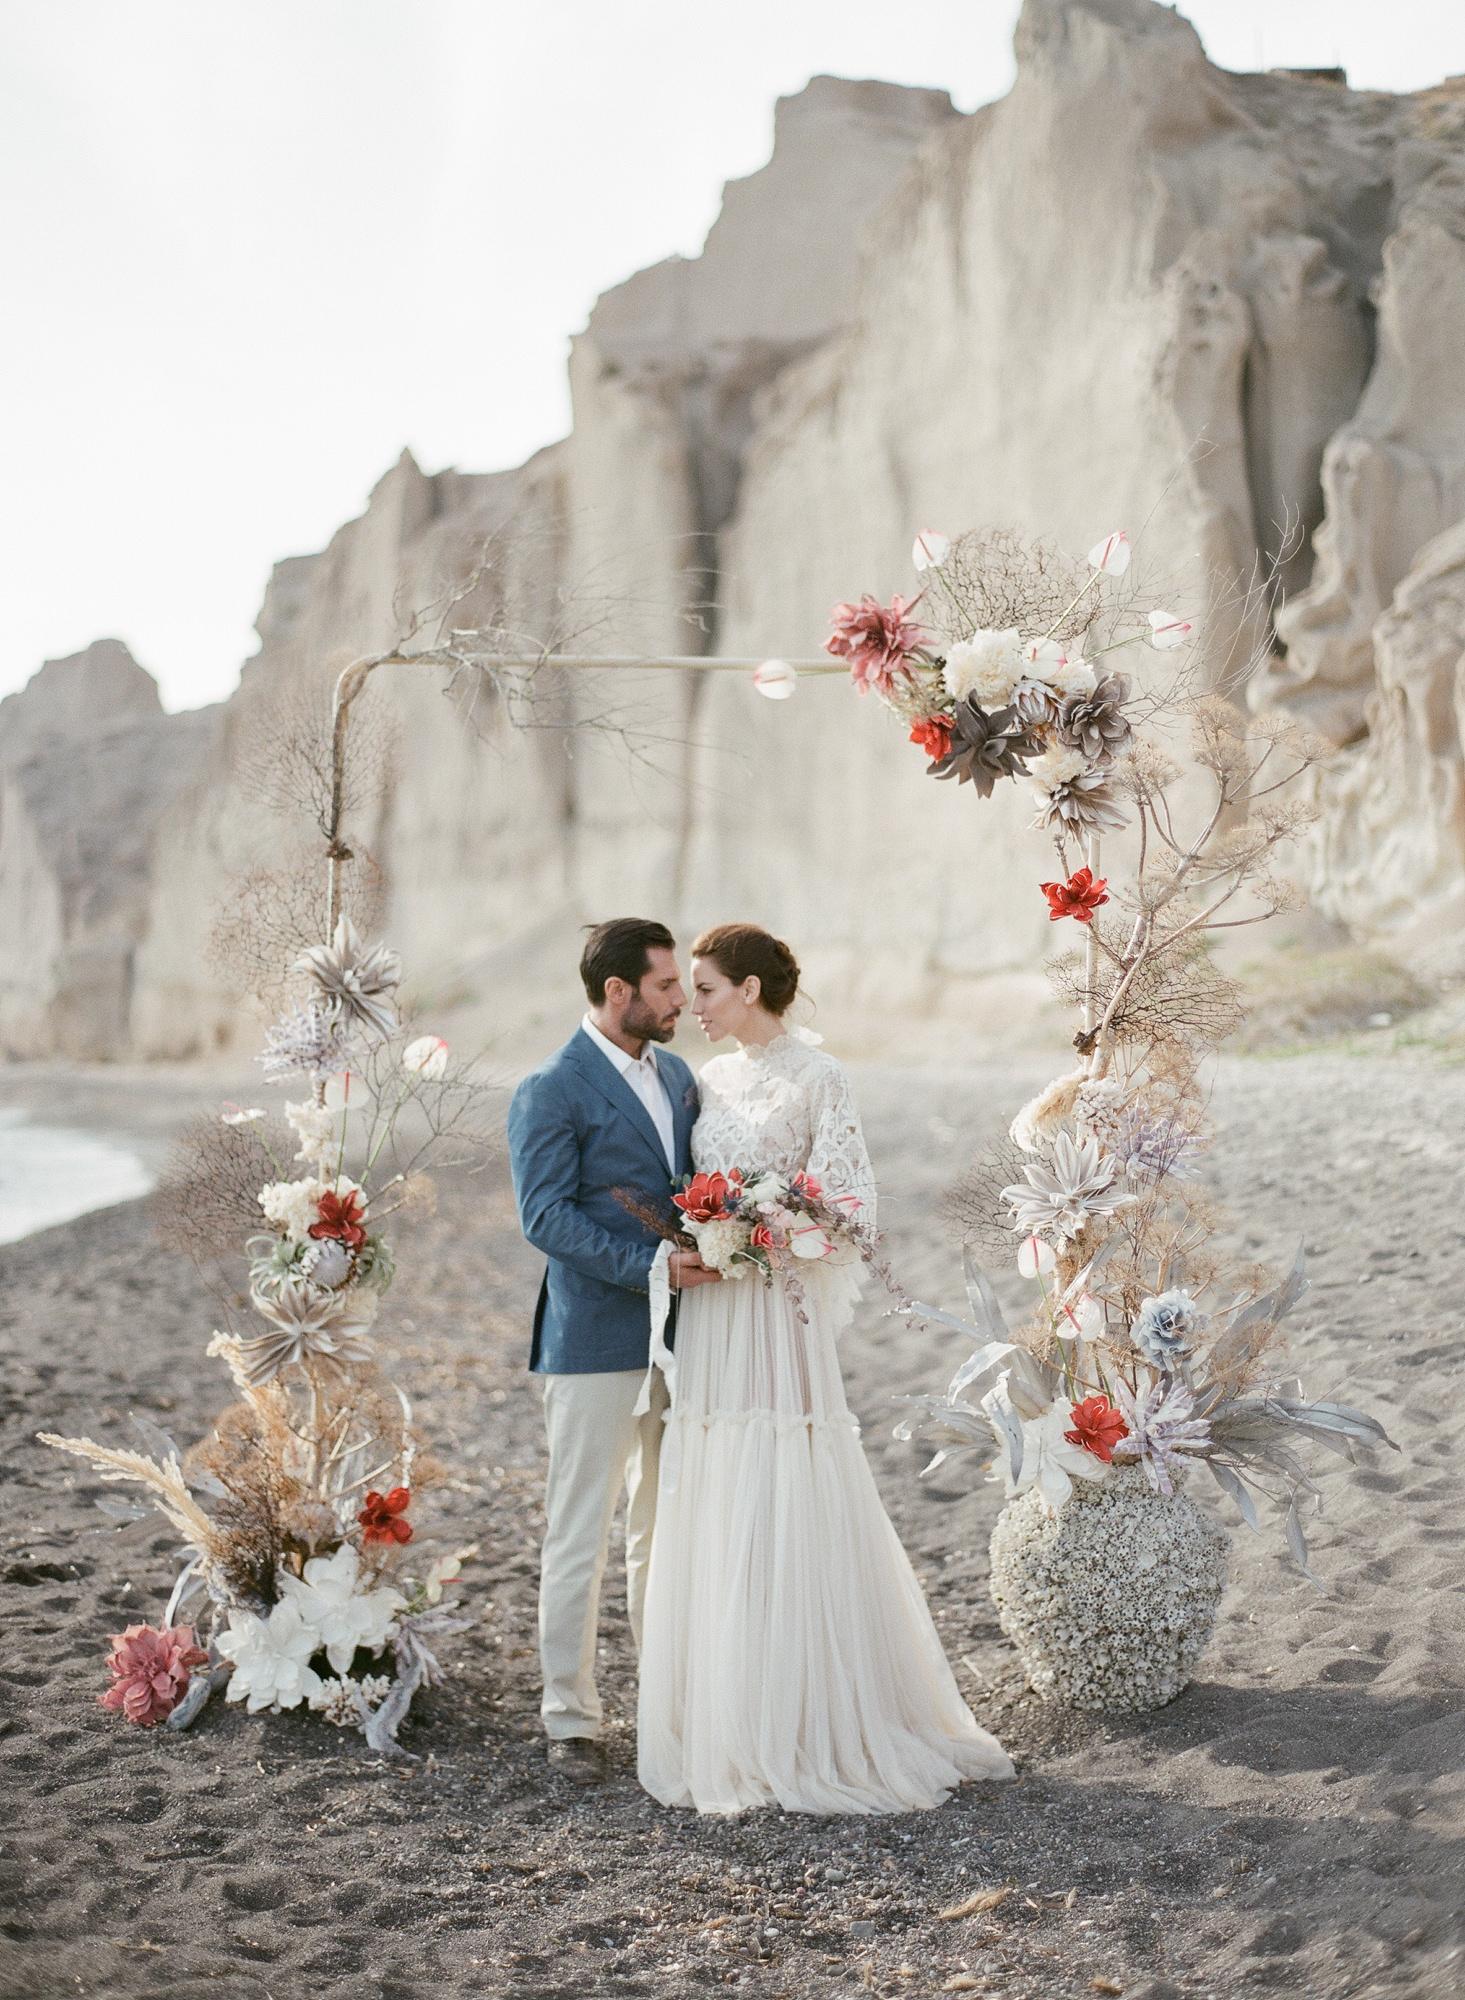 romantic-beach-arbor-grey-orange-florals-vintage-gown-blue-suit-coat-taupe-pants-gianluca-adiovaso-italy